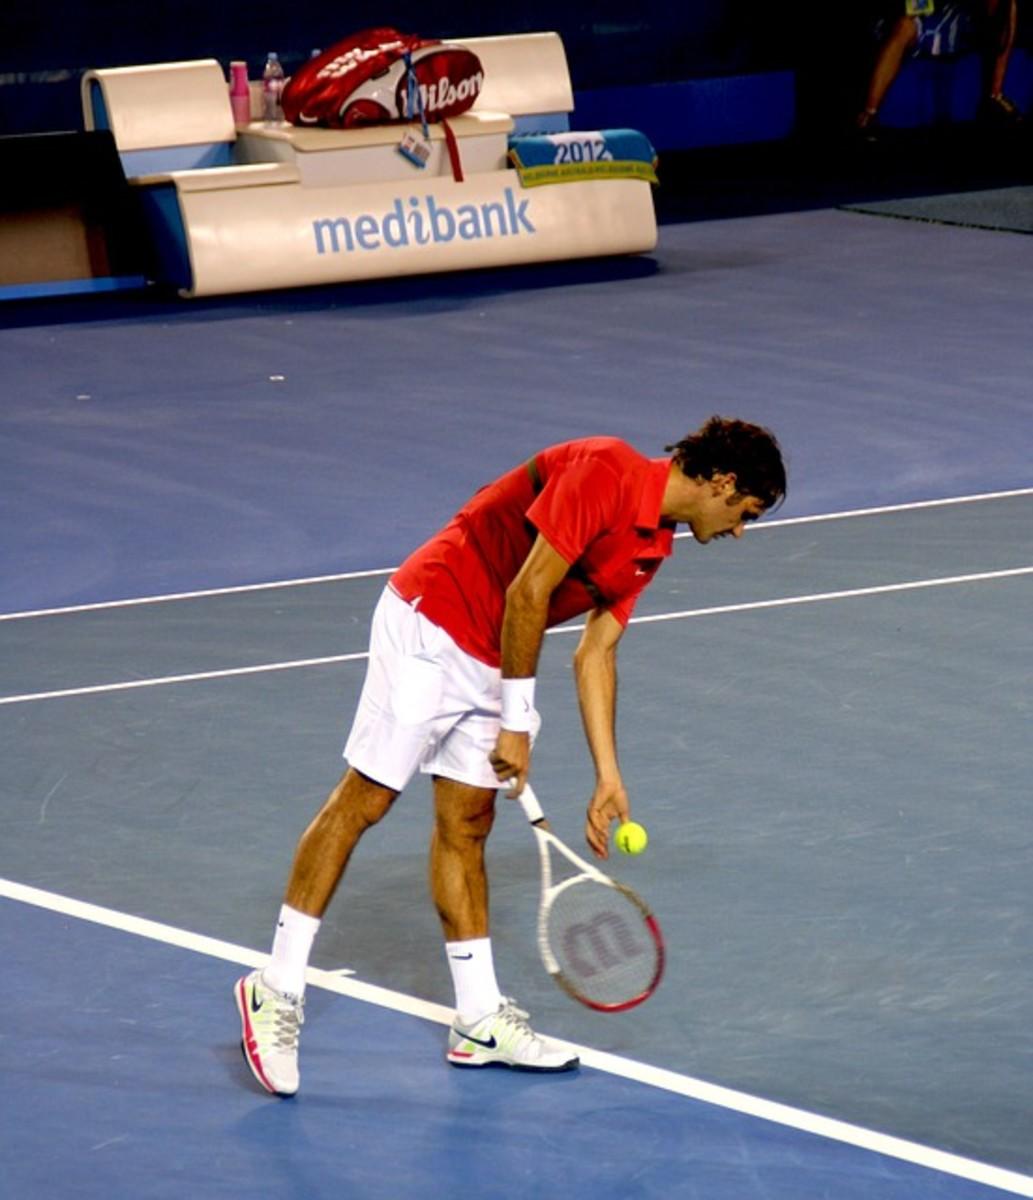 Roger Federer makes his serve look effortless. Like most pros, he uses a form of backhand grip for serving; in Federer's case, a mild eastern backhand.